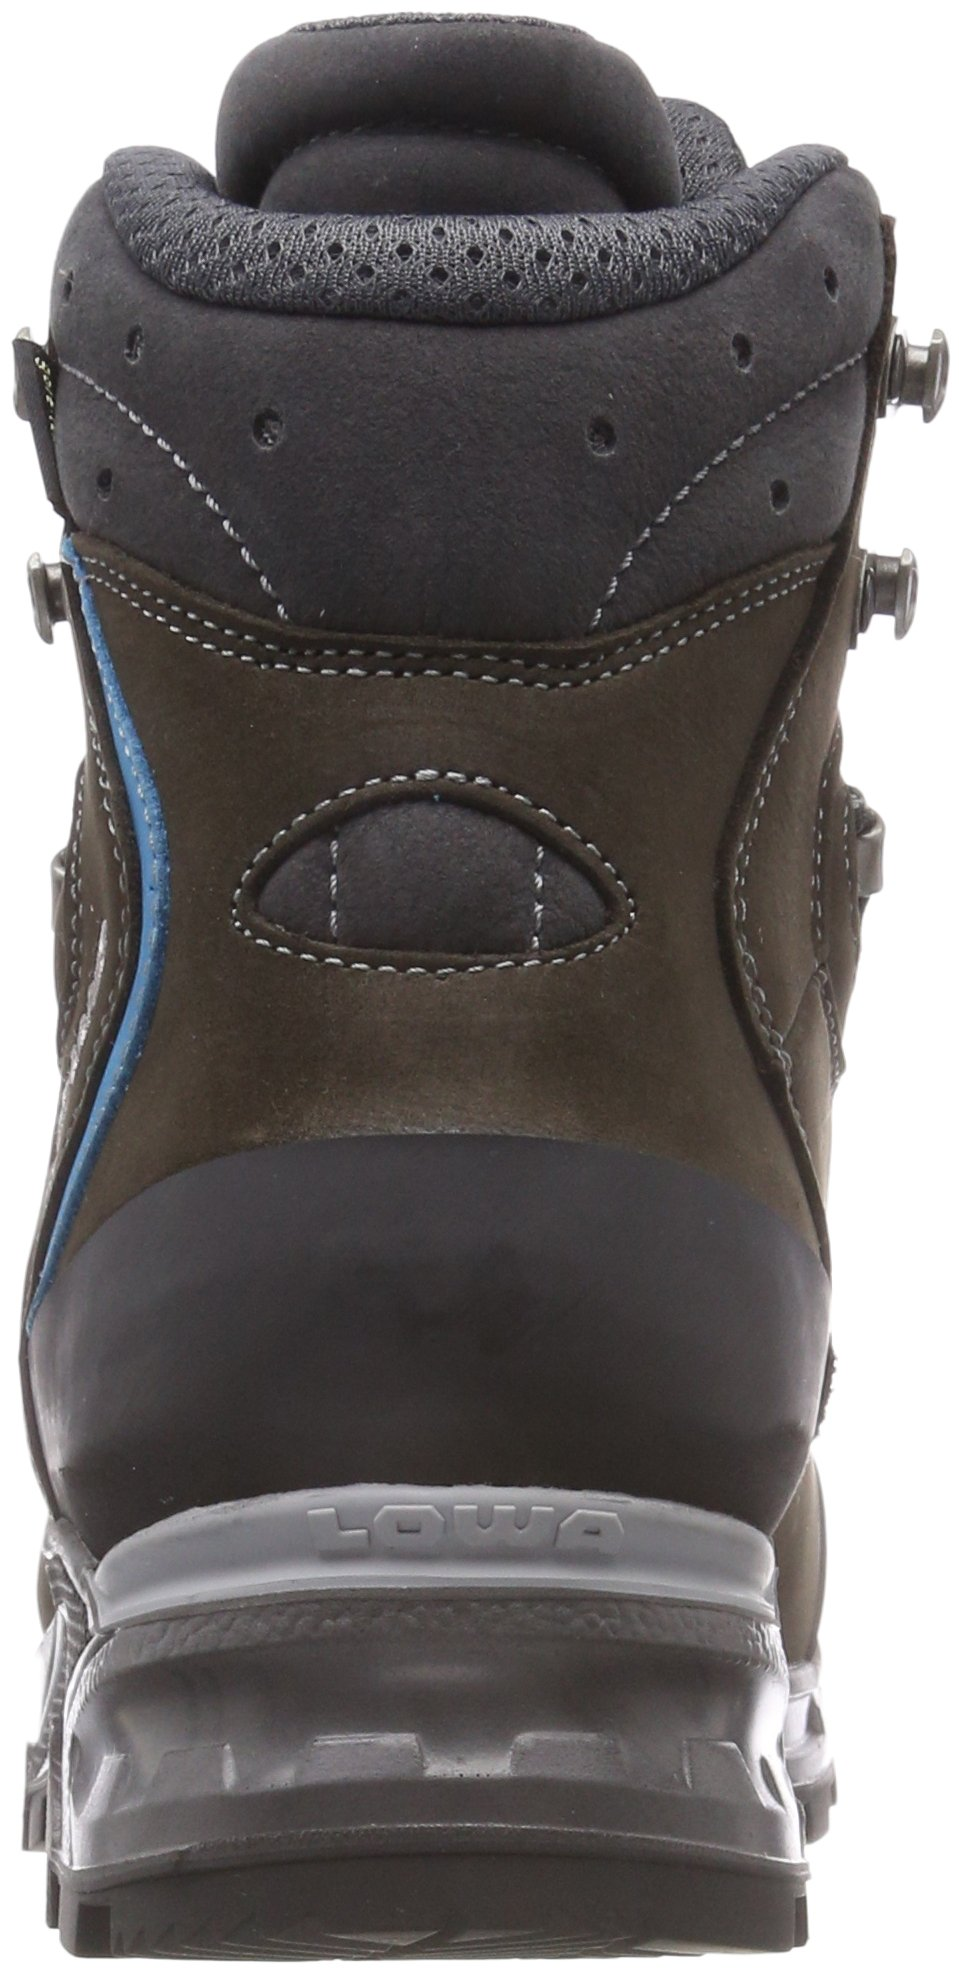 71jzpSv5xyL - Lowa Women's Mauria GTX Ws High Rise Hiking Boots